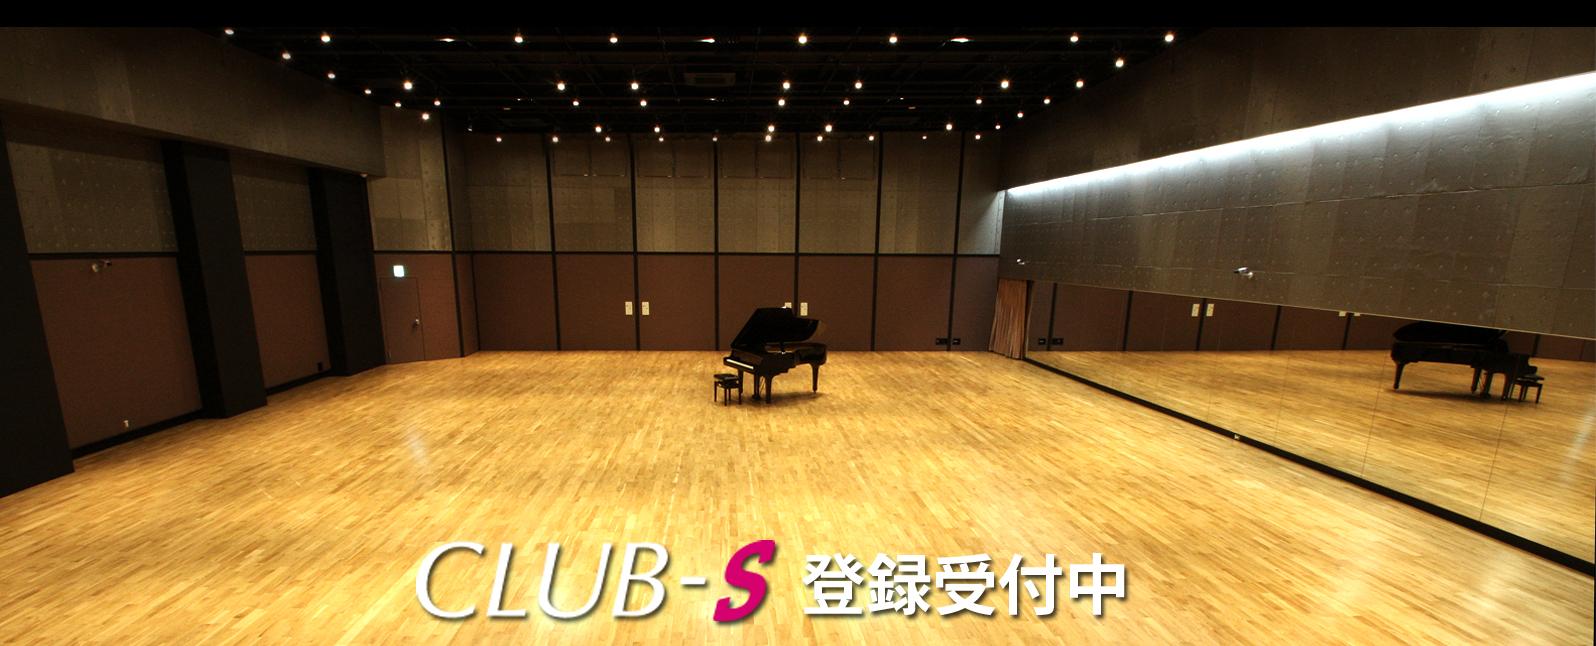 clubs31